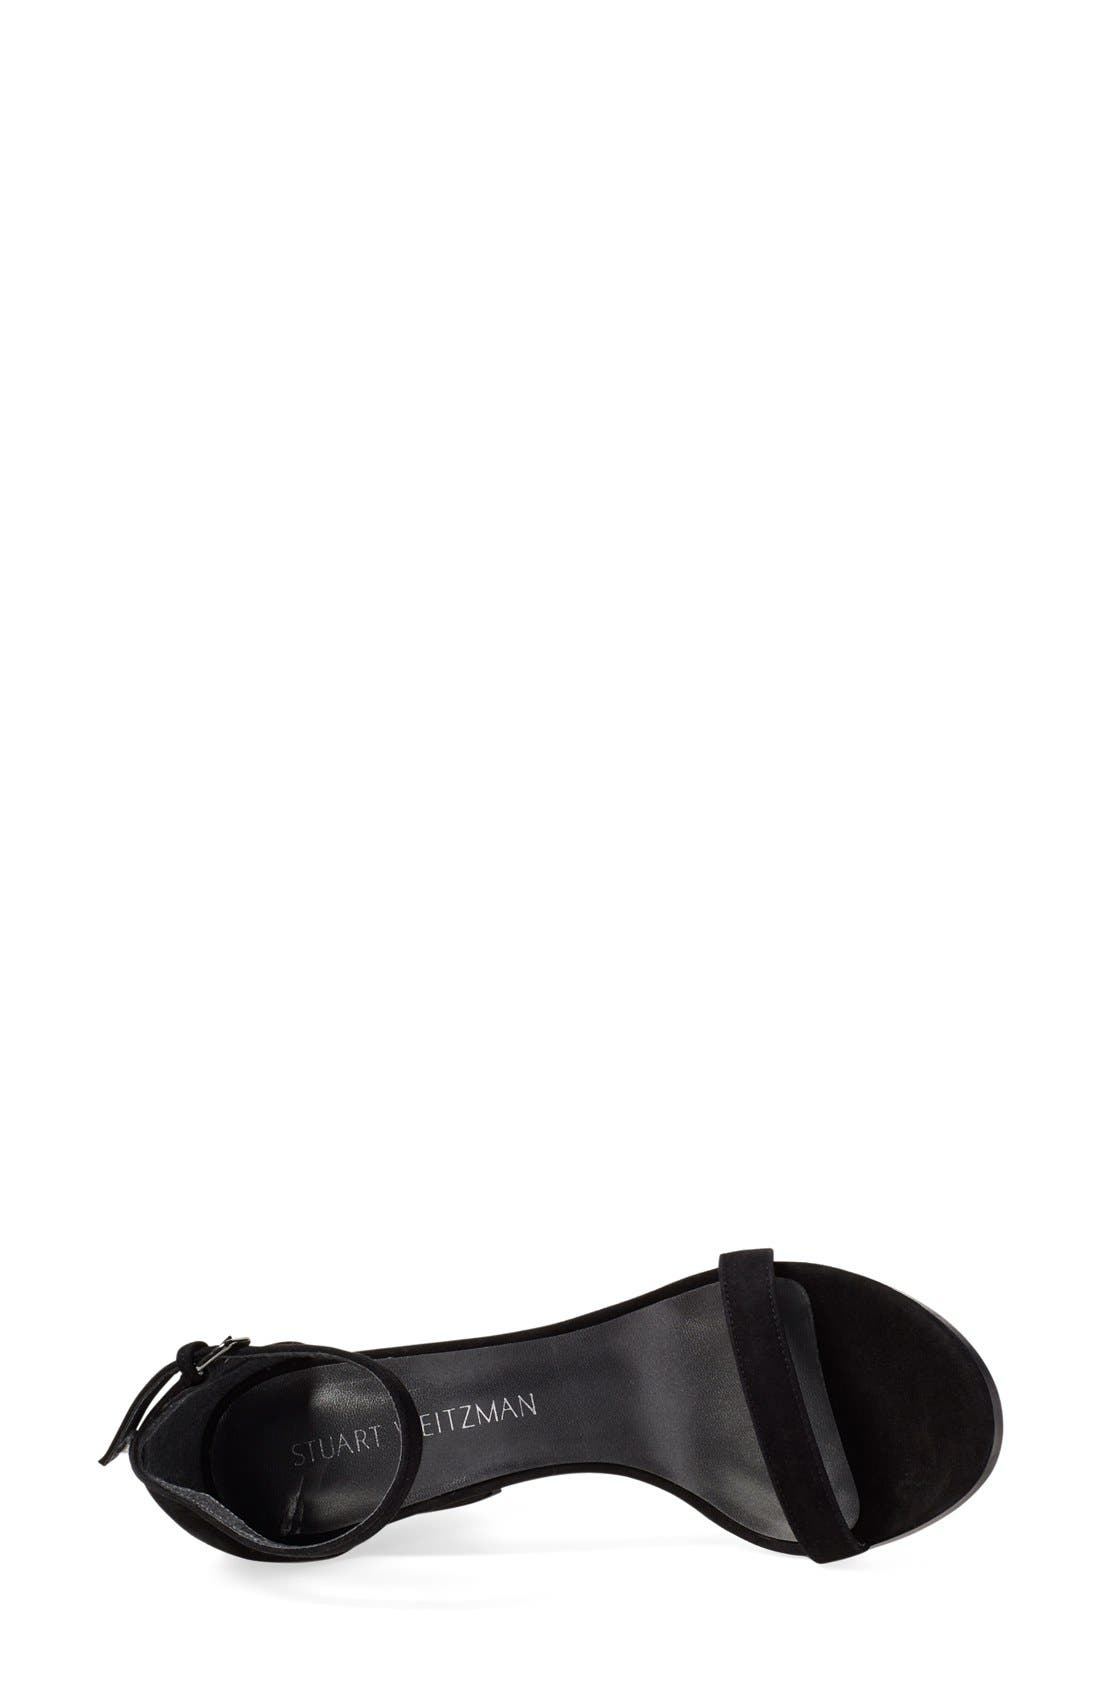 Simple Ankle Strap Sandal,                             Alternate thumbnail 9, color,                             BLACK SUEDE